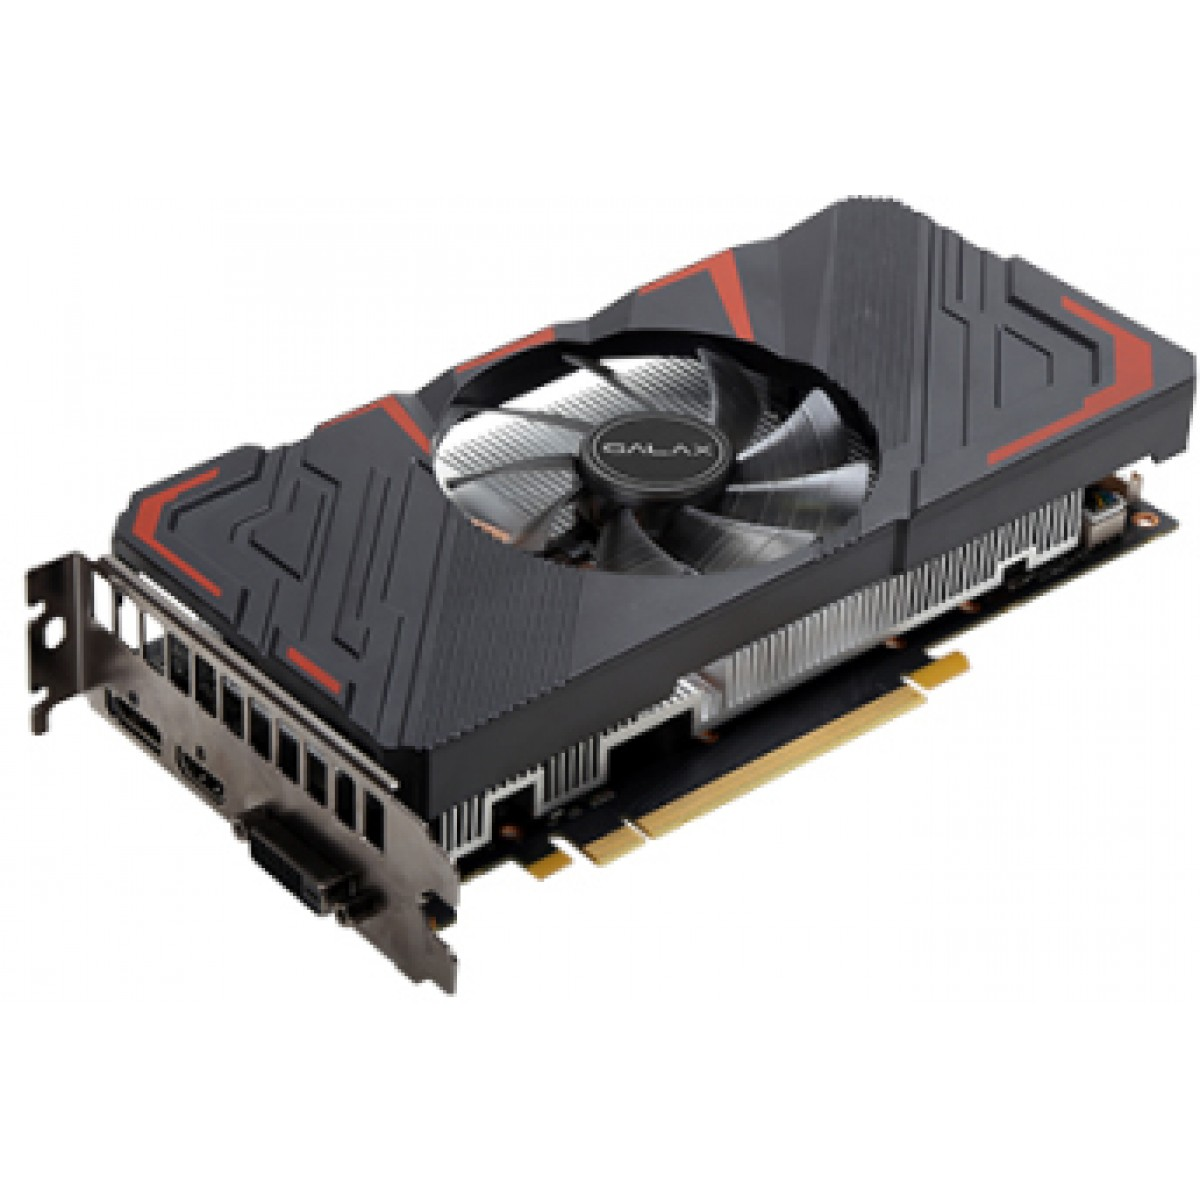 Placa de Vídeo Galax GeForce GTX 1660 Ti Prodigy, 6GB GDDR6, 192Bit, 60IRL7DS46PY